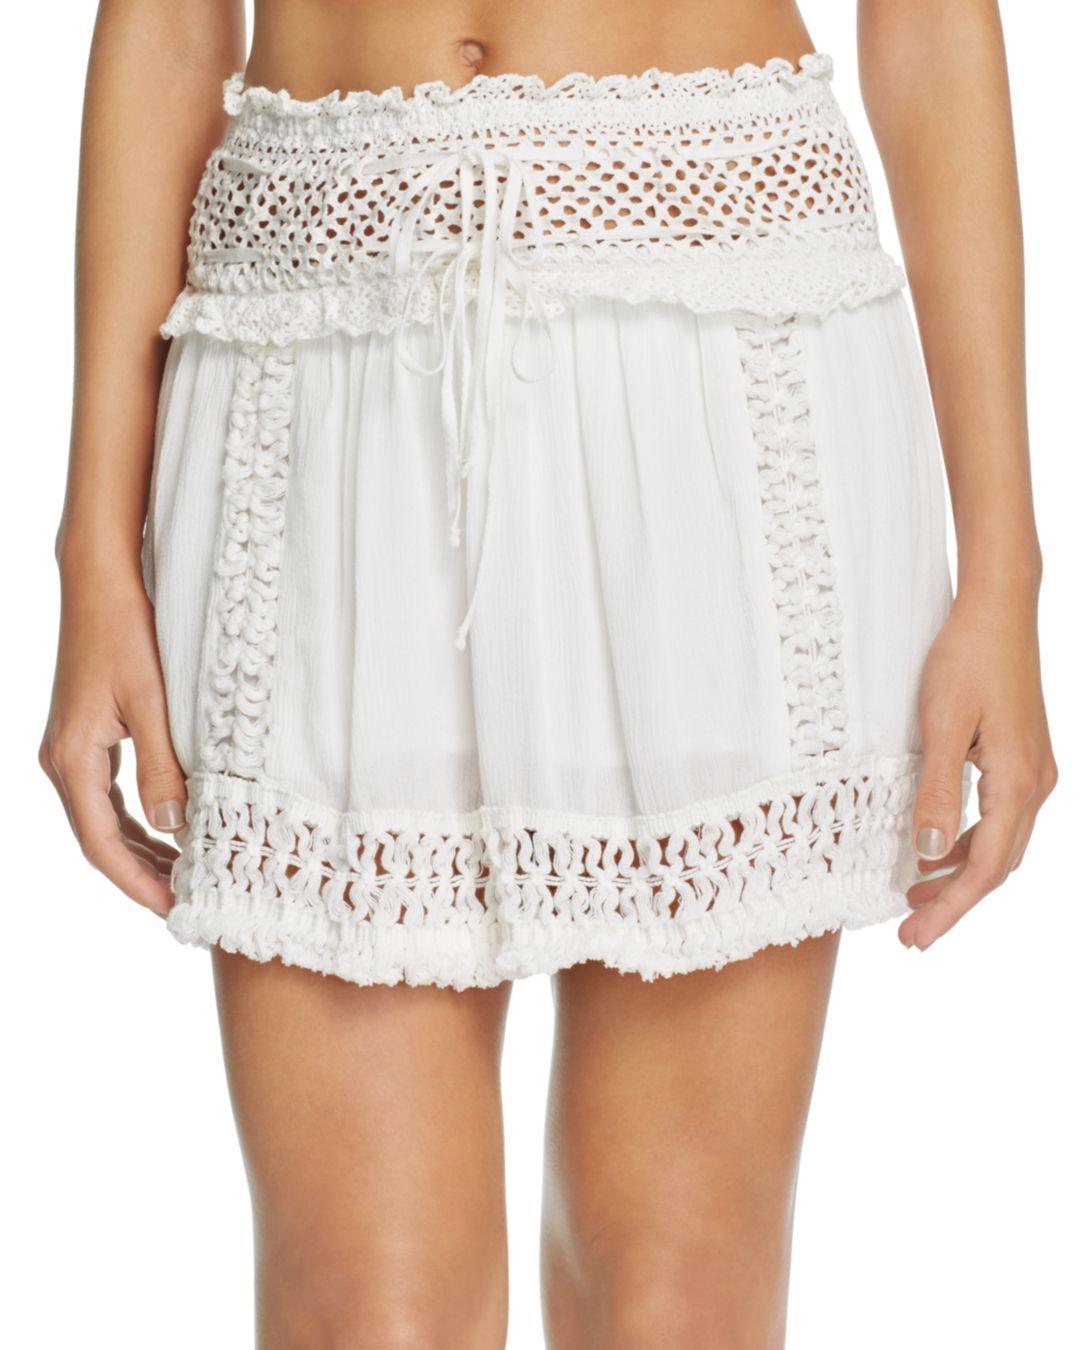 3a1da97a66 Surf Gypsy Crochet Fringe Mini Skirt Swim Cover - Up in White - Lyst